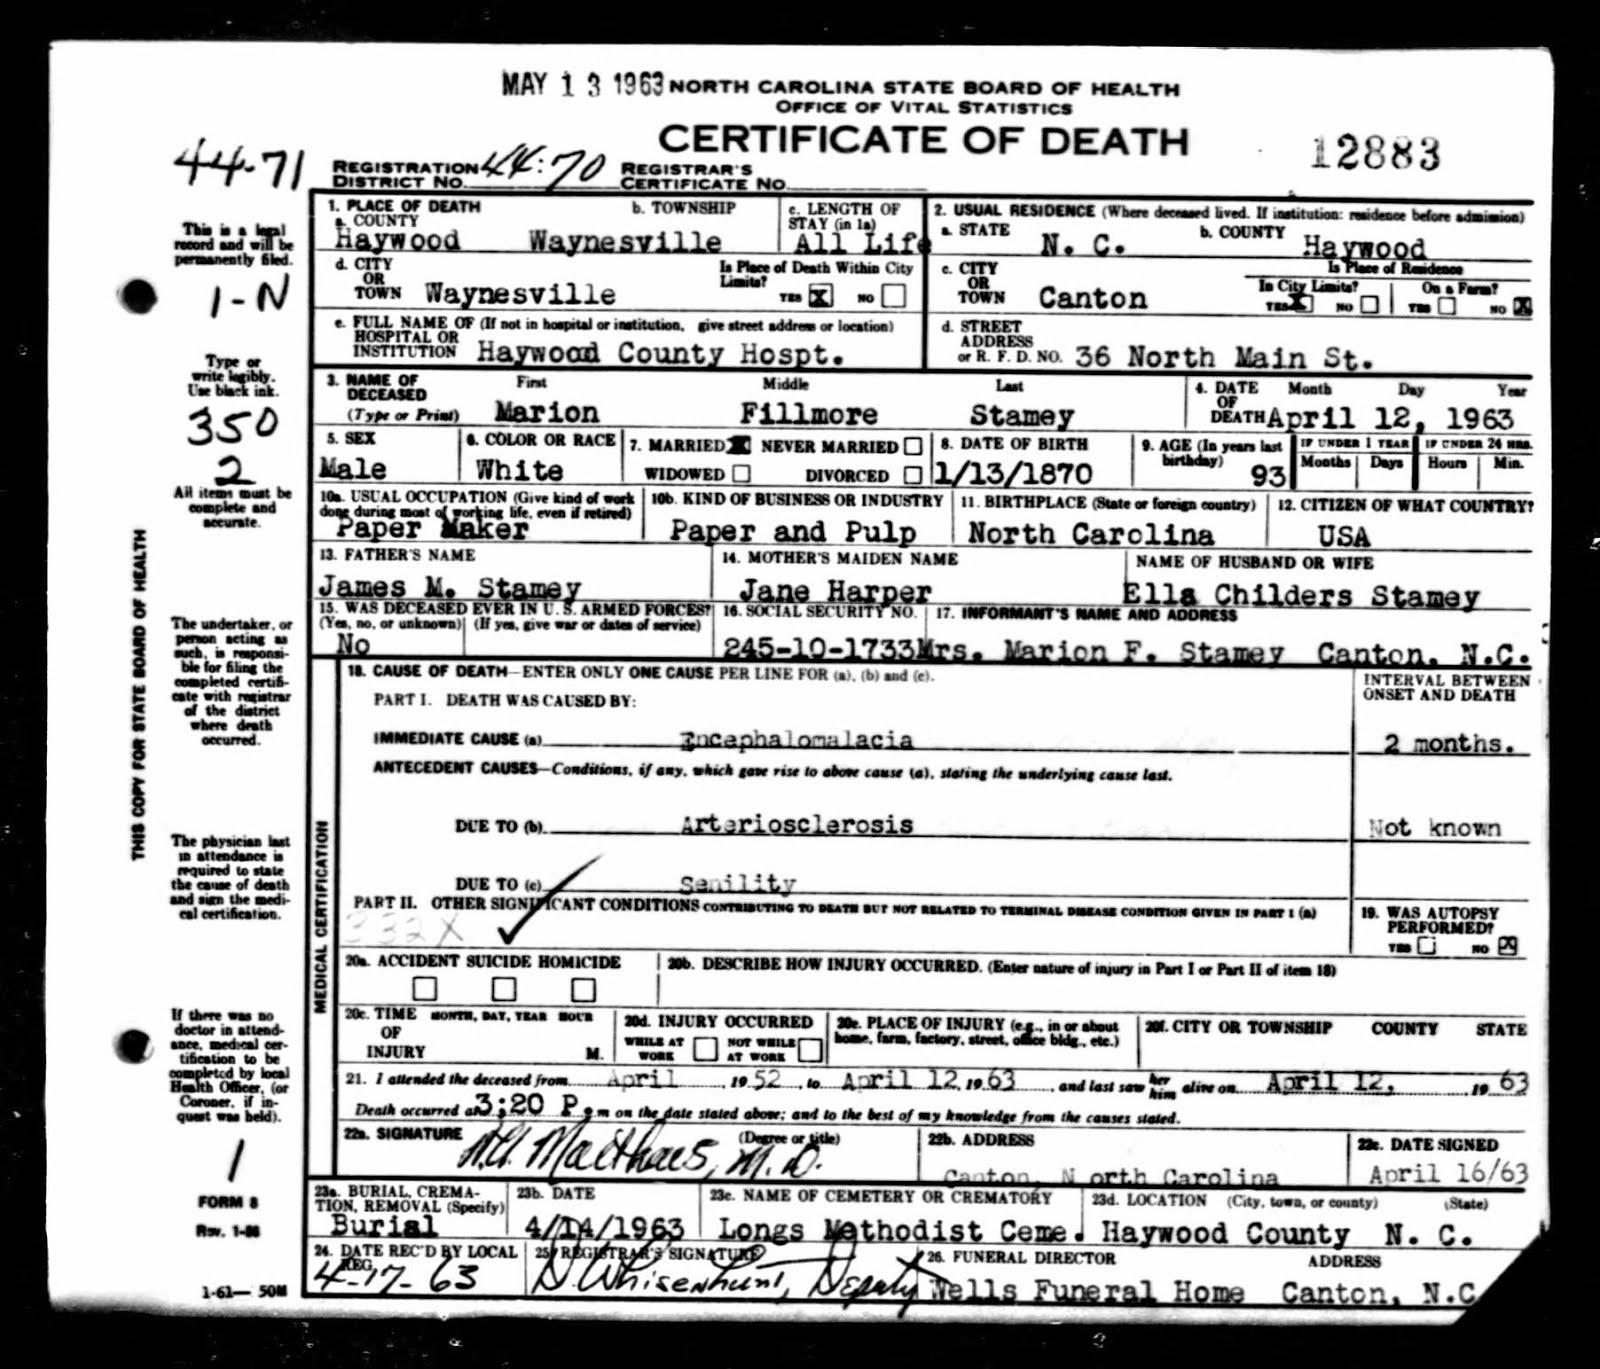 Dred blalock family history harris rosetta blalock stamey 1867 1949 north carolina death certificates 1909 1976 xflitez Gallery